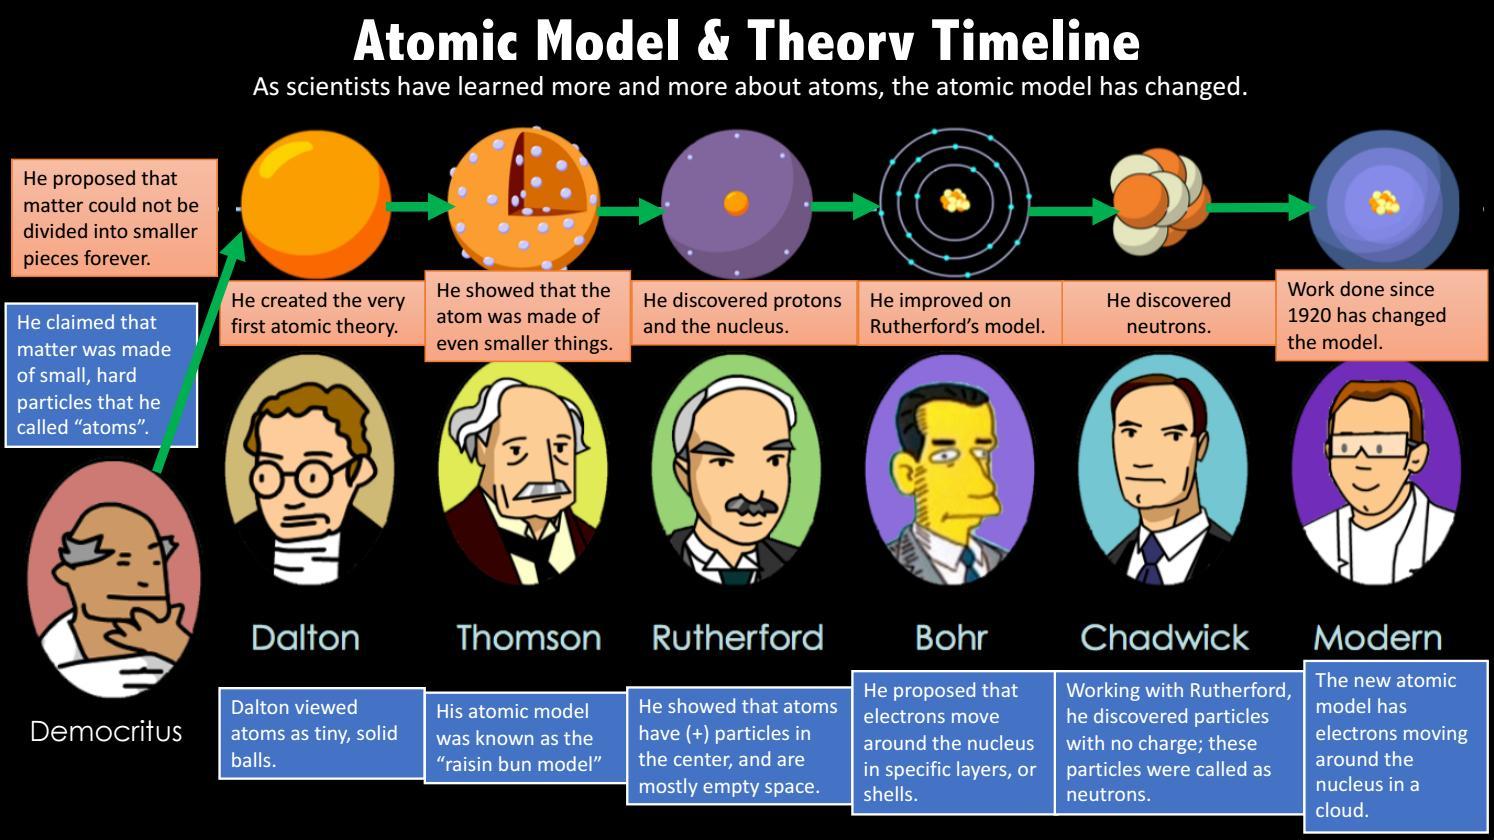 atomic models timeline by daenna gonz u00e1lez